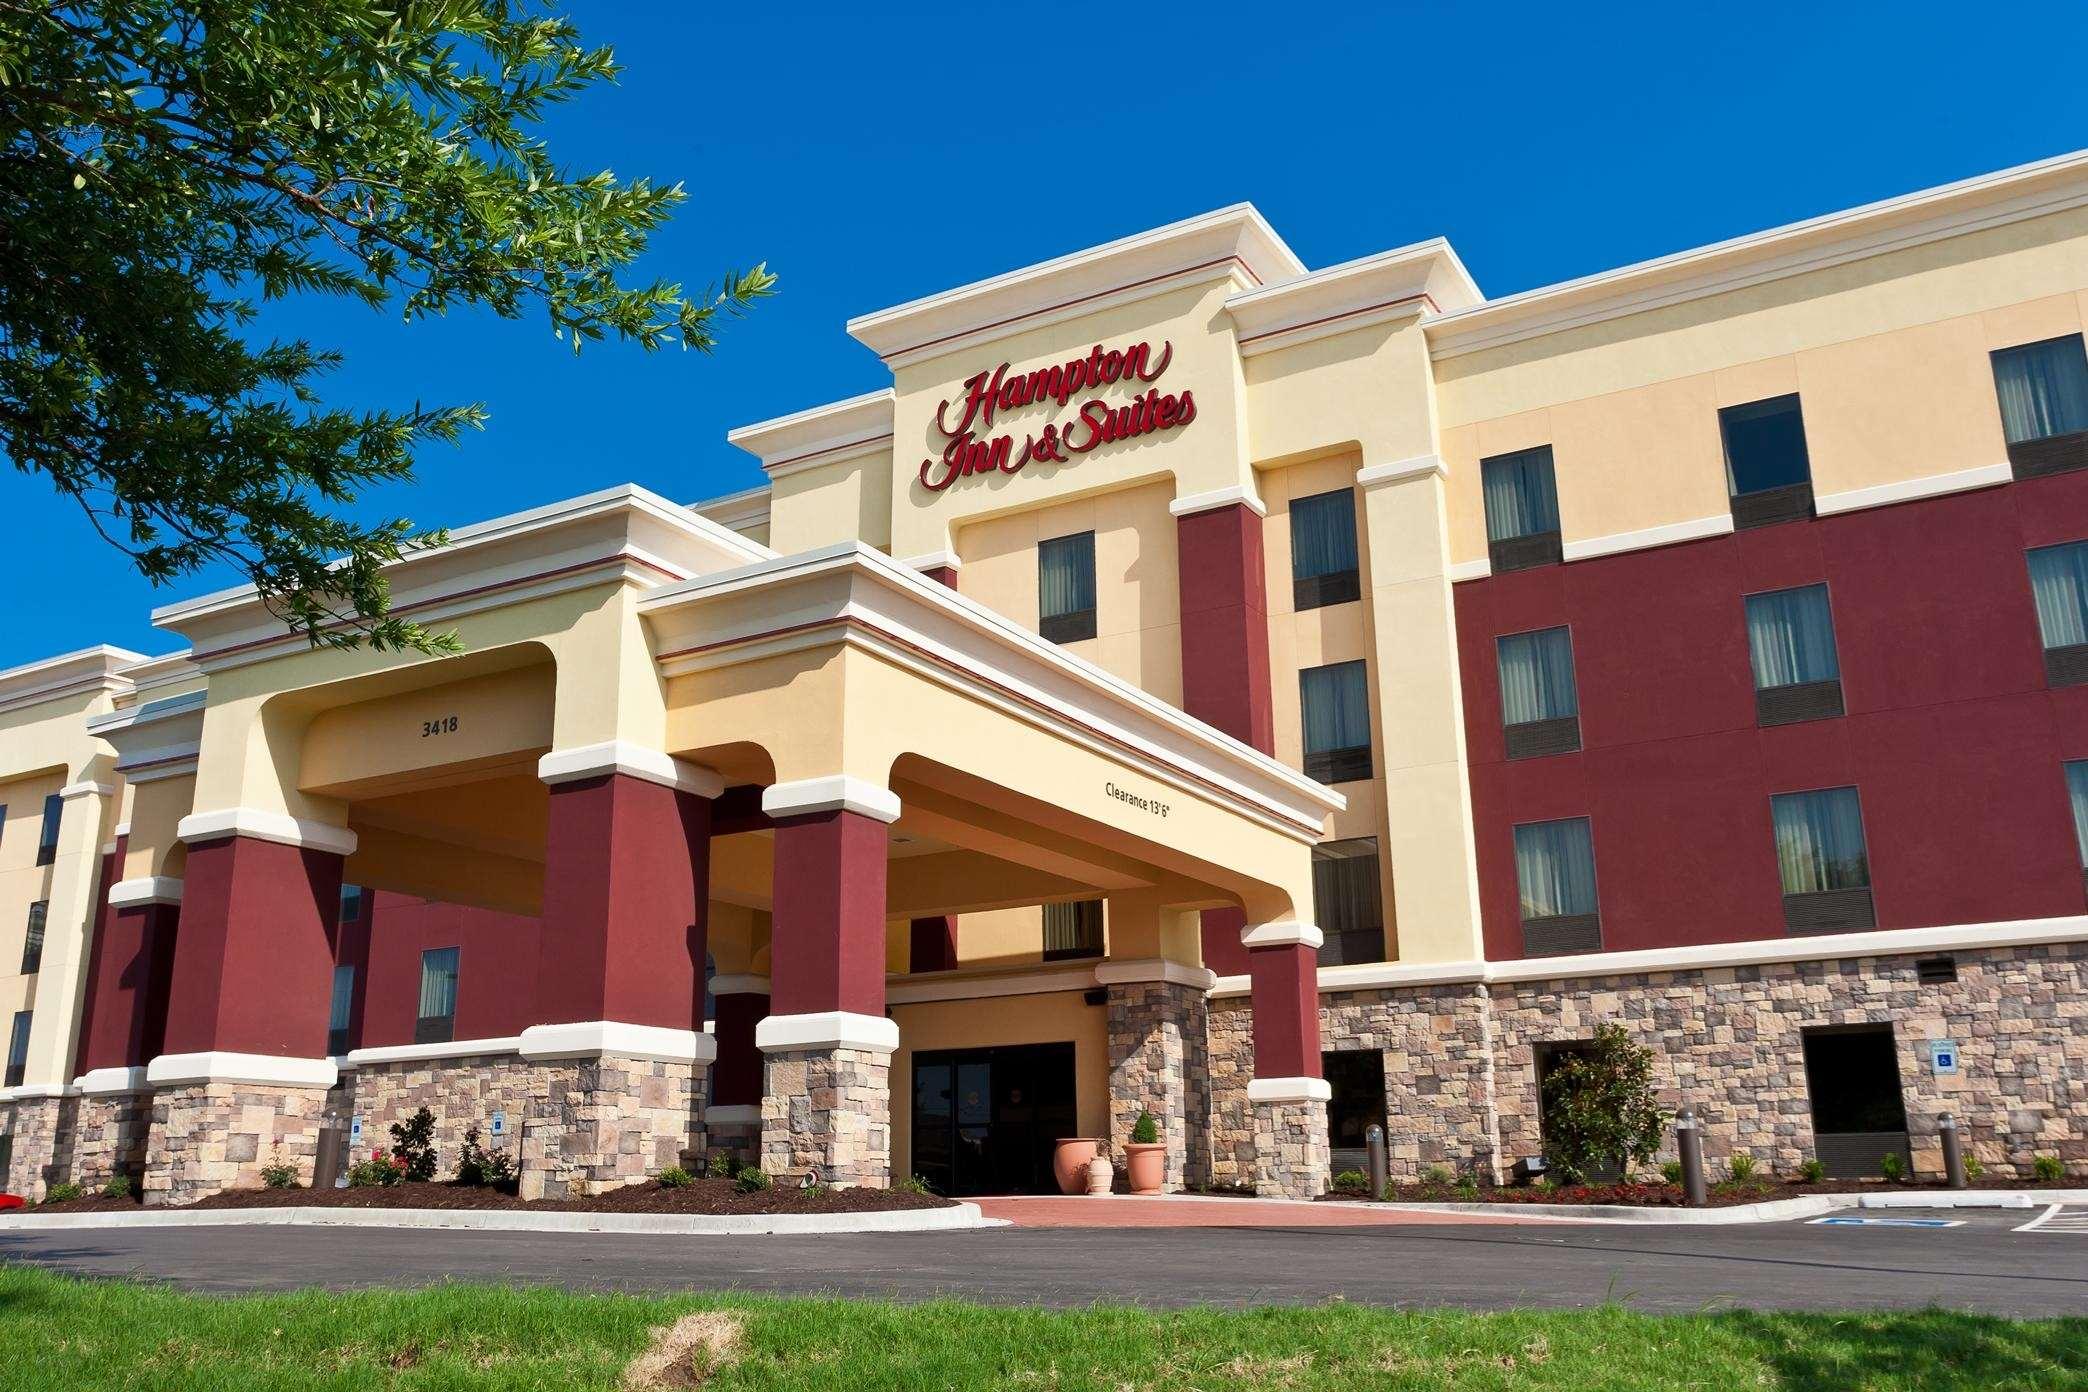 Hampton Inn & Suites Tulsa/Central image 21